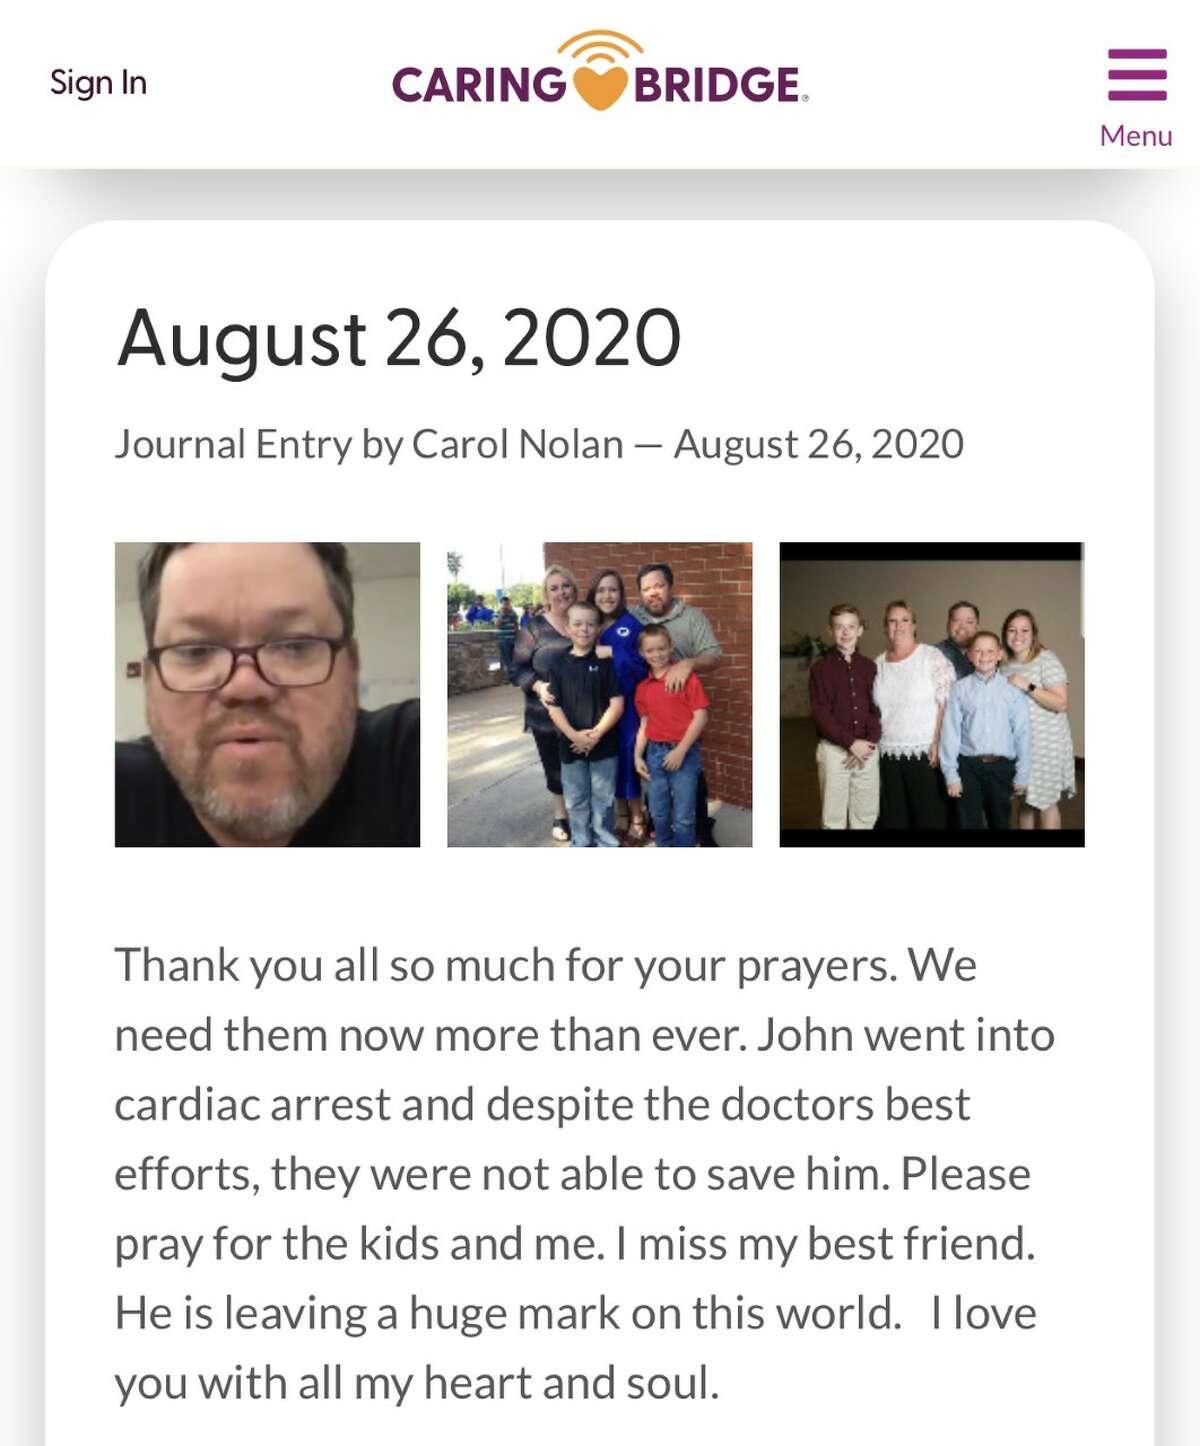 In an Aug. 26 journal entry on CaringBridge, John Nolan's wife Carol wrote: